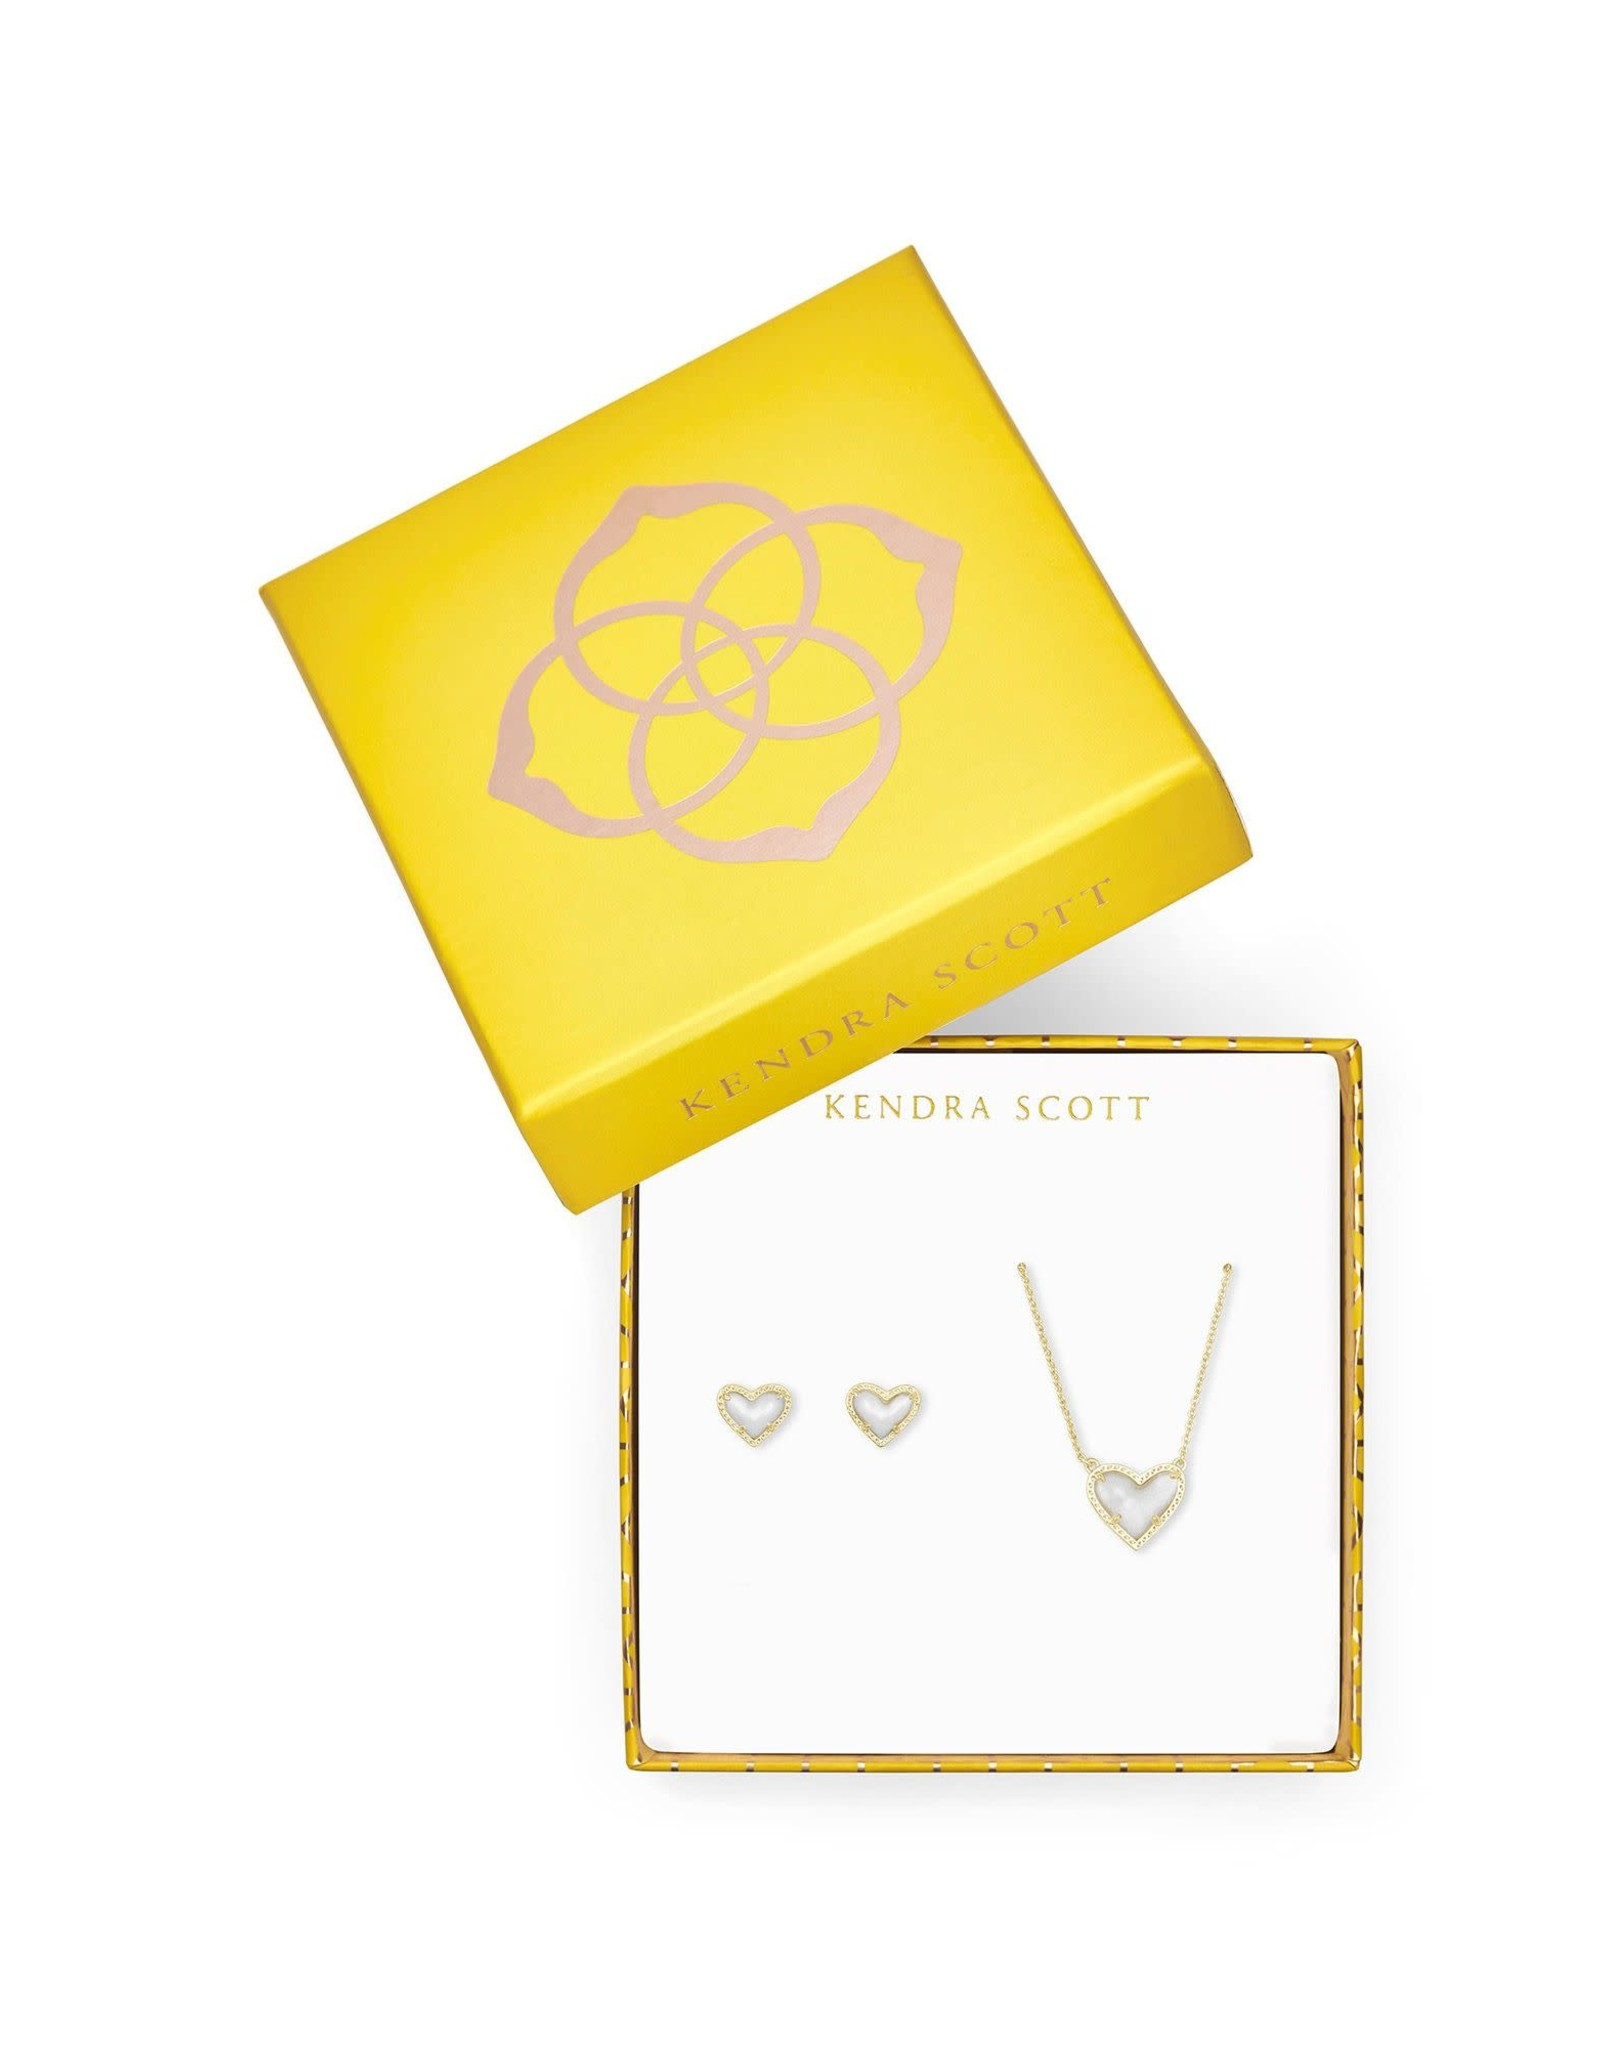 Kendra Scott 4217717912 - Ari Heart Pendant & Stud Gift Set - Ivory MOP/Gold